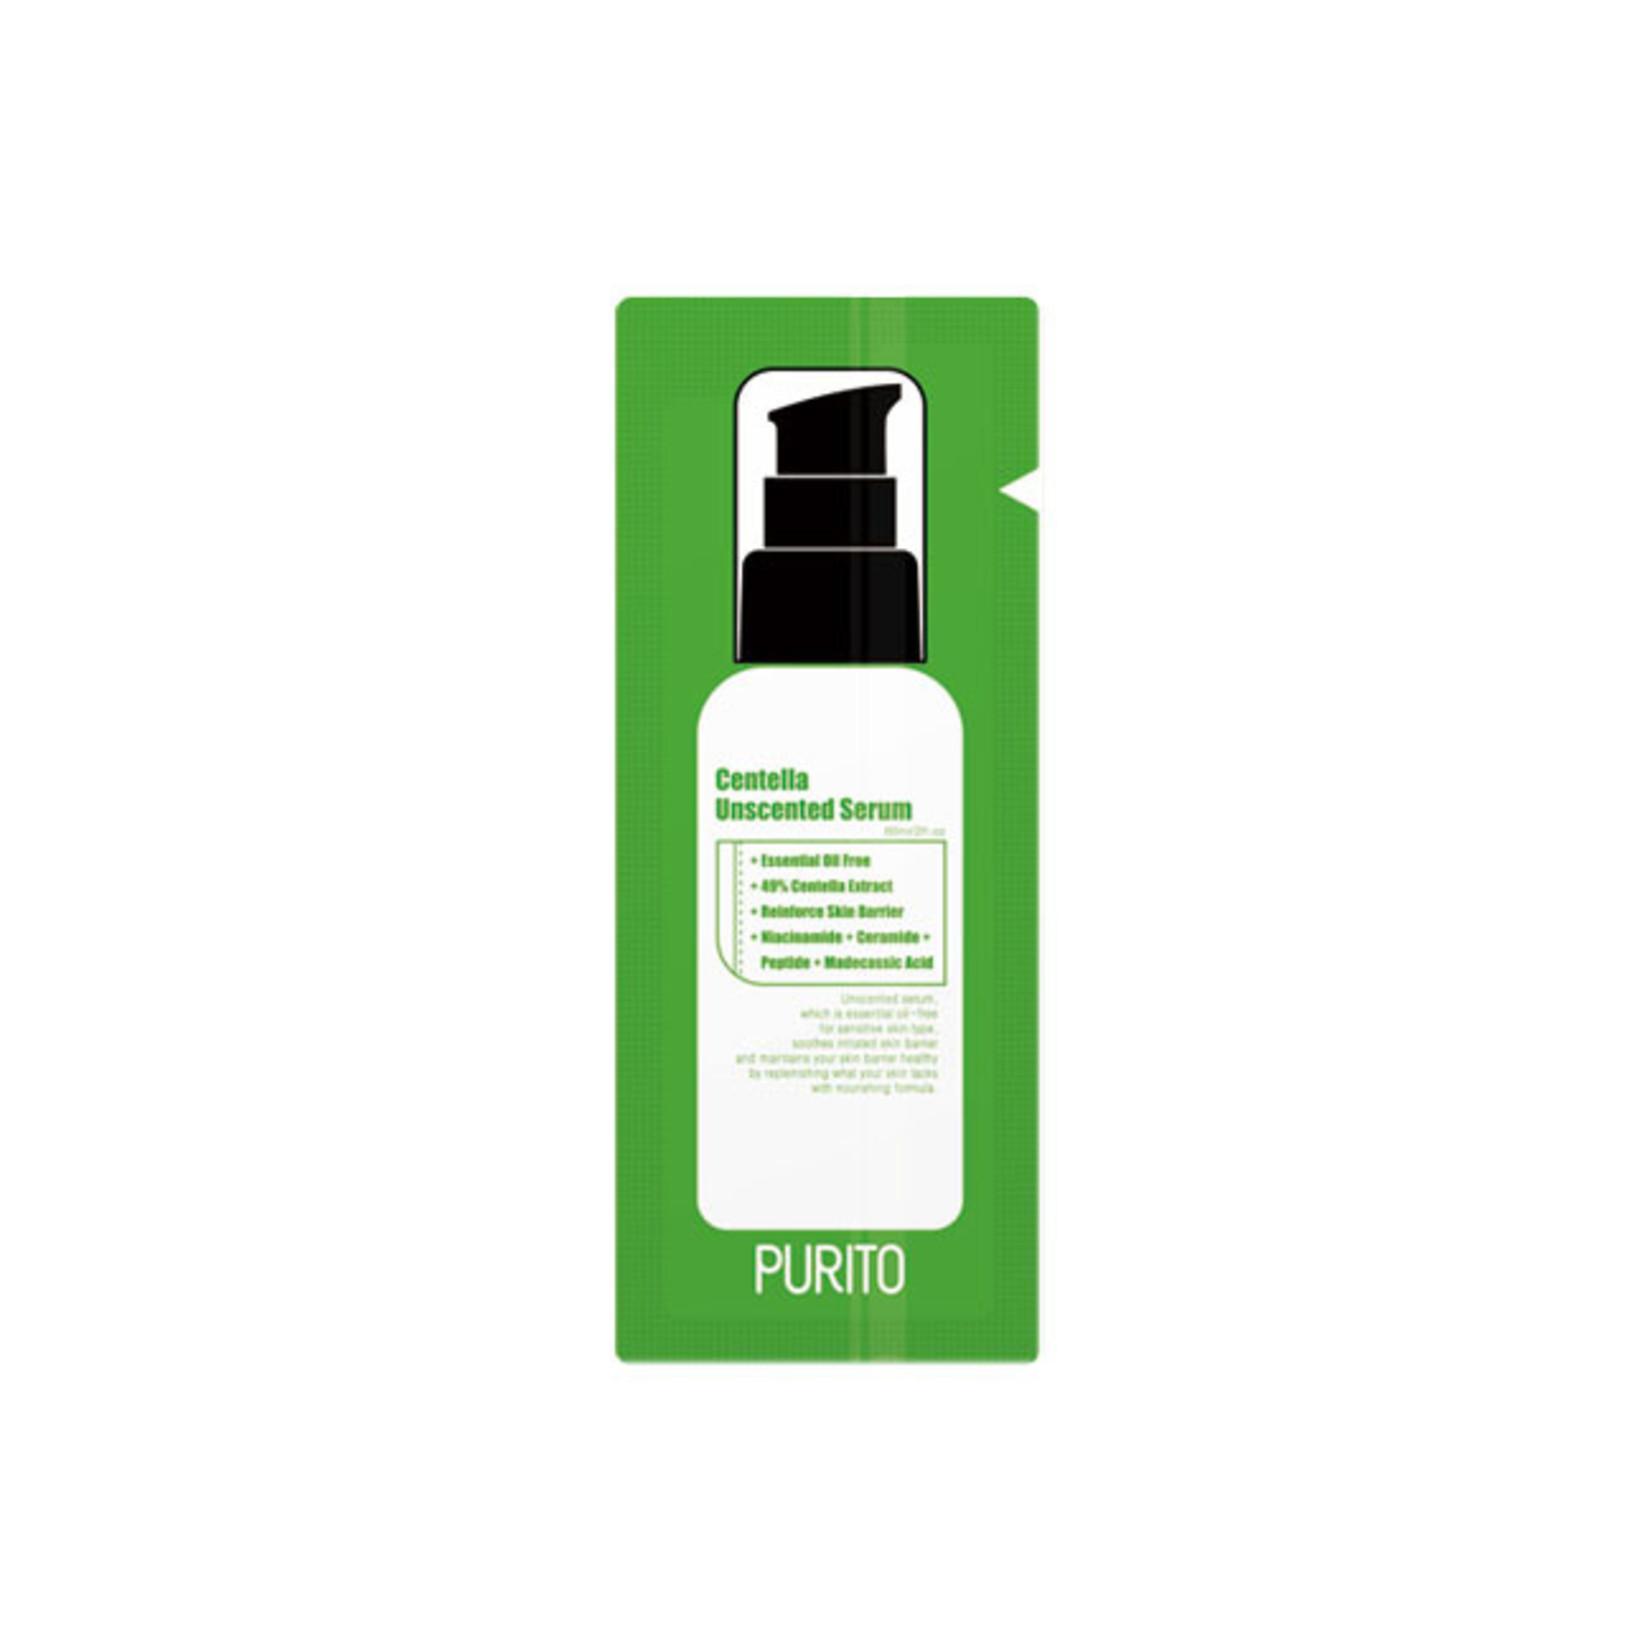 Purito Centella Unscented Serum Sample 50pcs